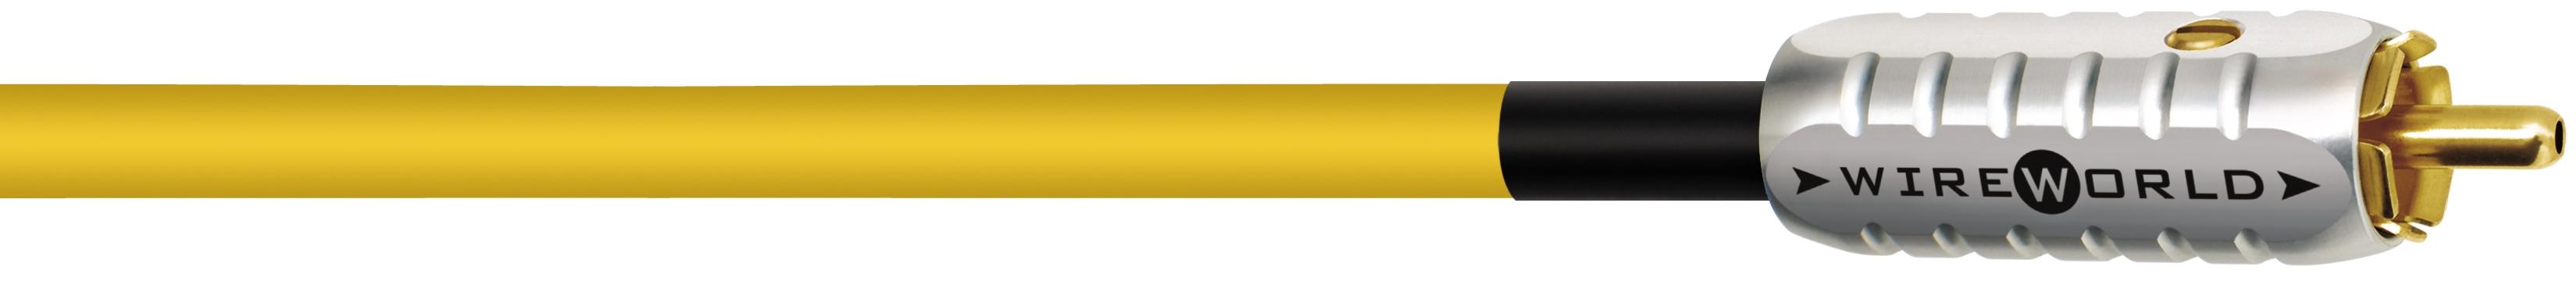 WireWorld Chroma 75 ohm Digital Audio kaapeli RCA